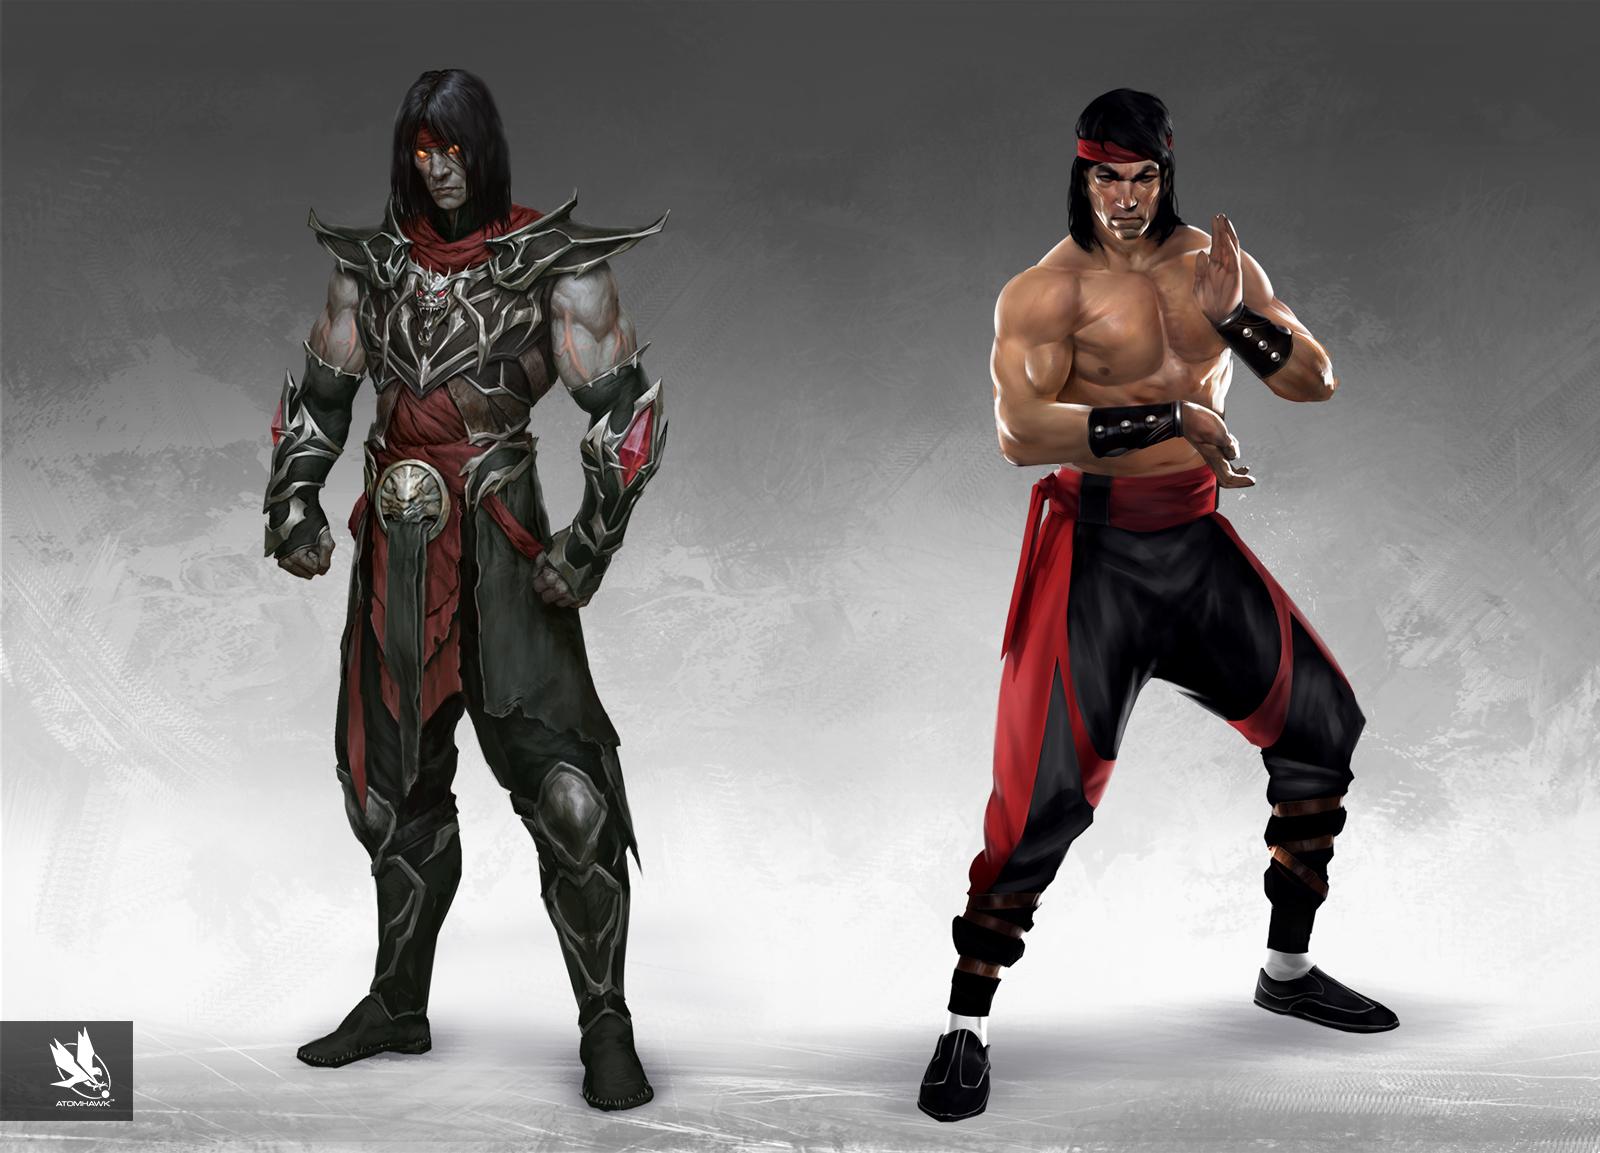 Atomhawk_Warner-Bros-NetherRealm_Mortal-Kombat-11_Concept-Art_Character-Design_Side-by-Side_Liu-Kang.jpg